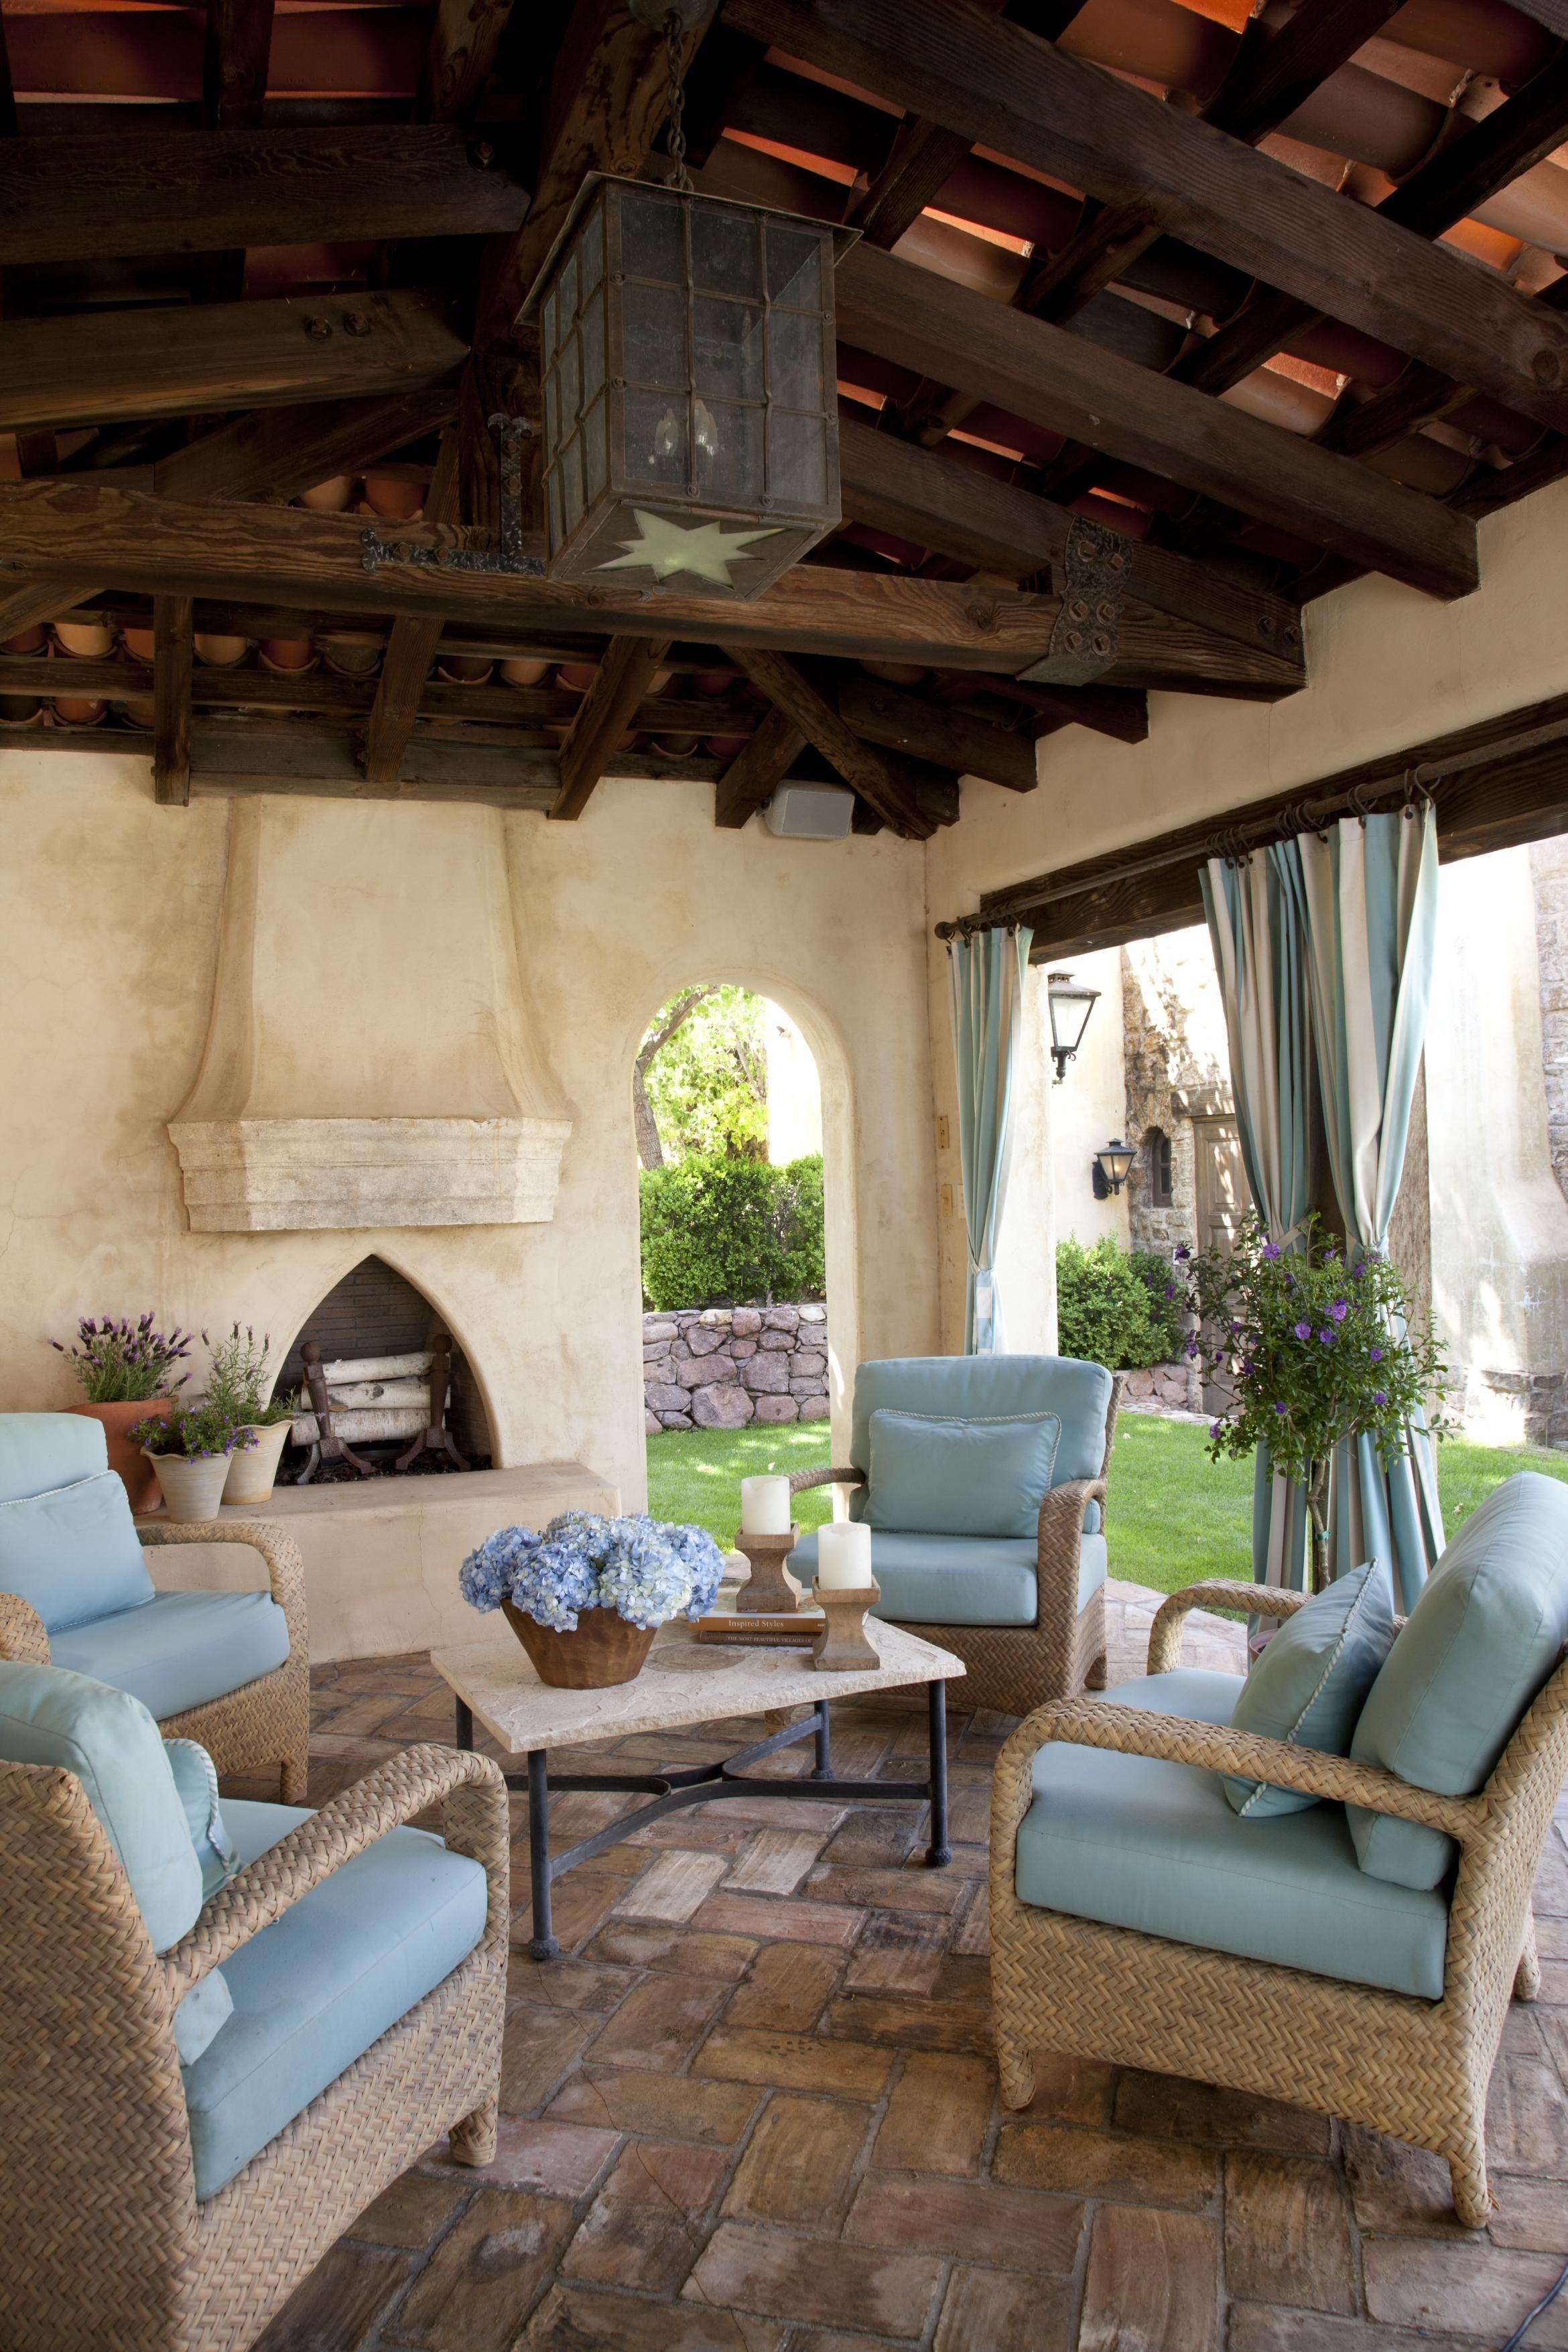 Mediterranean-Influenced Home in Arizona | Living room ...